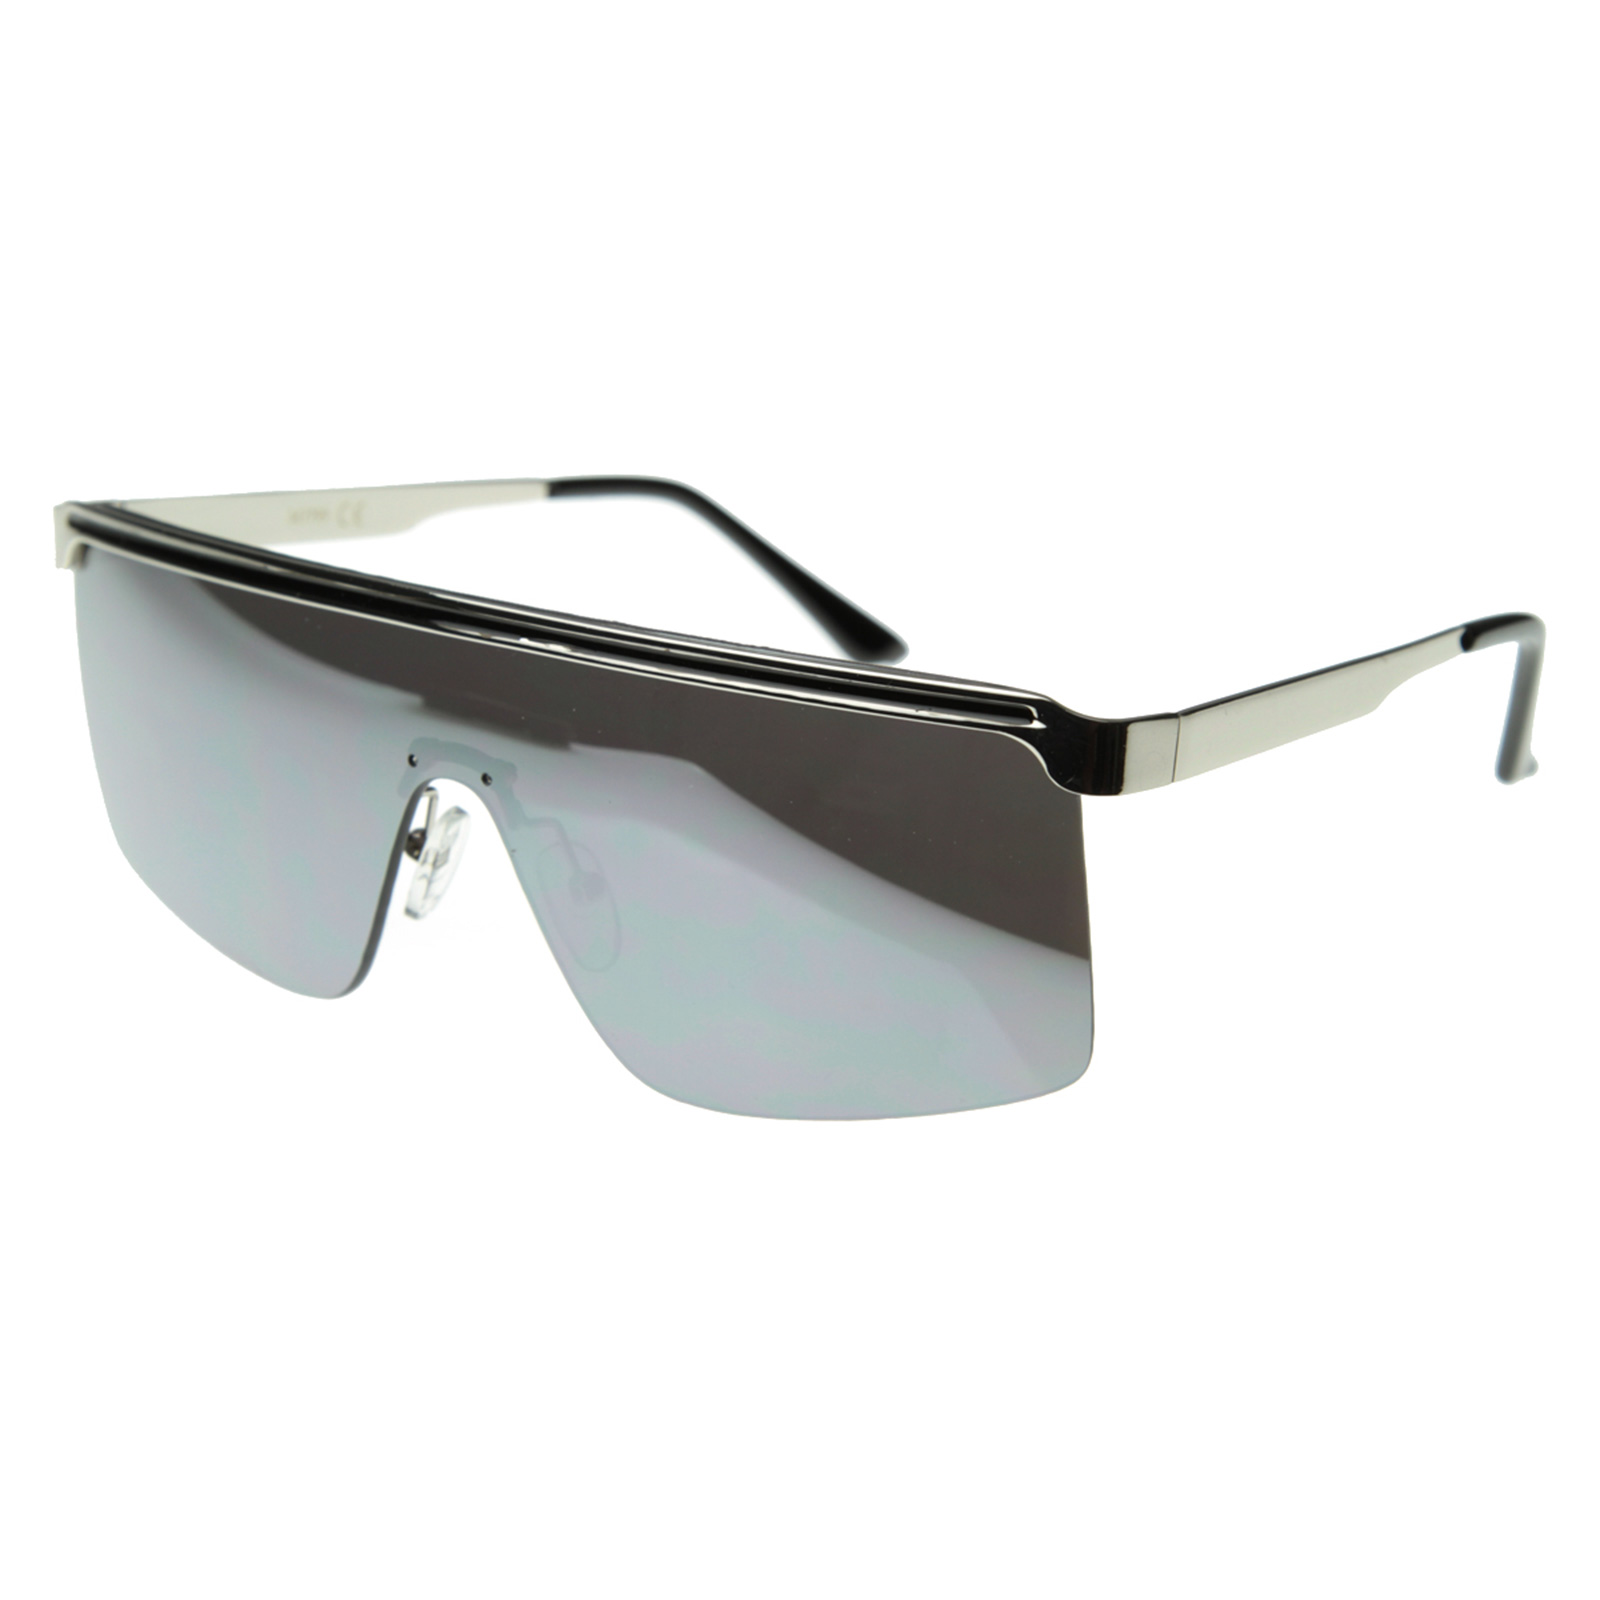 Future Modern Frameless Flat Top Shield Sunglasses 8257 eBay